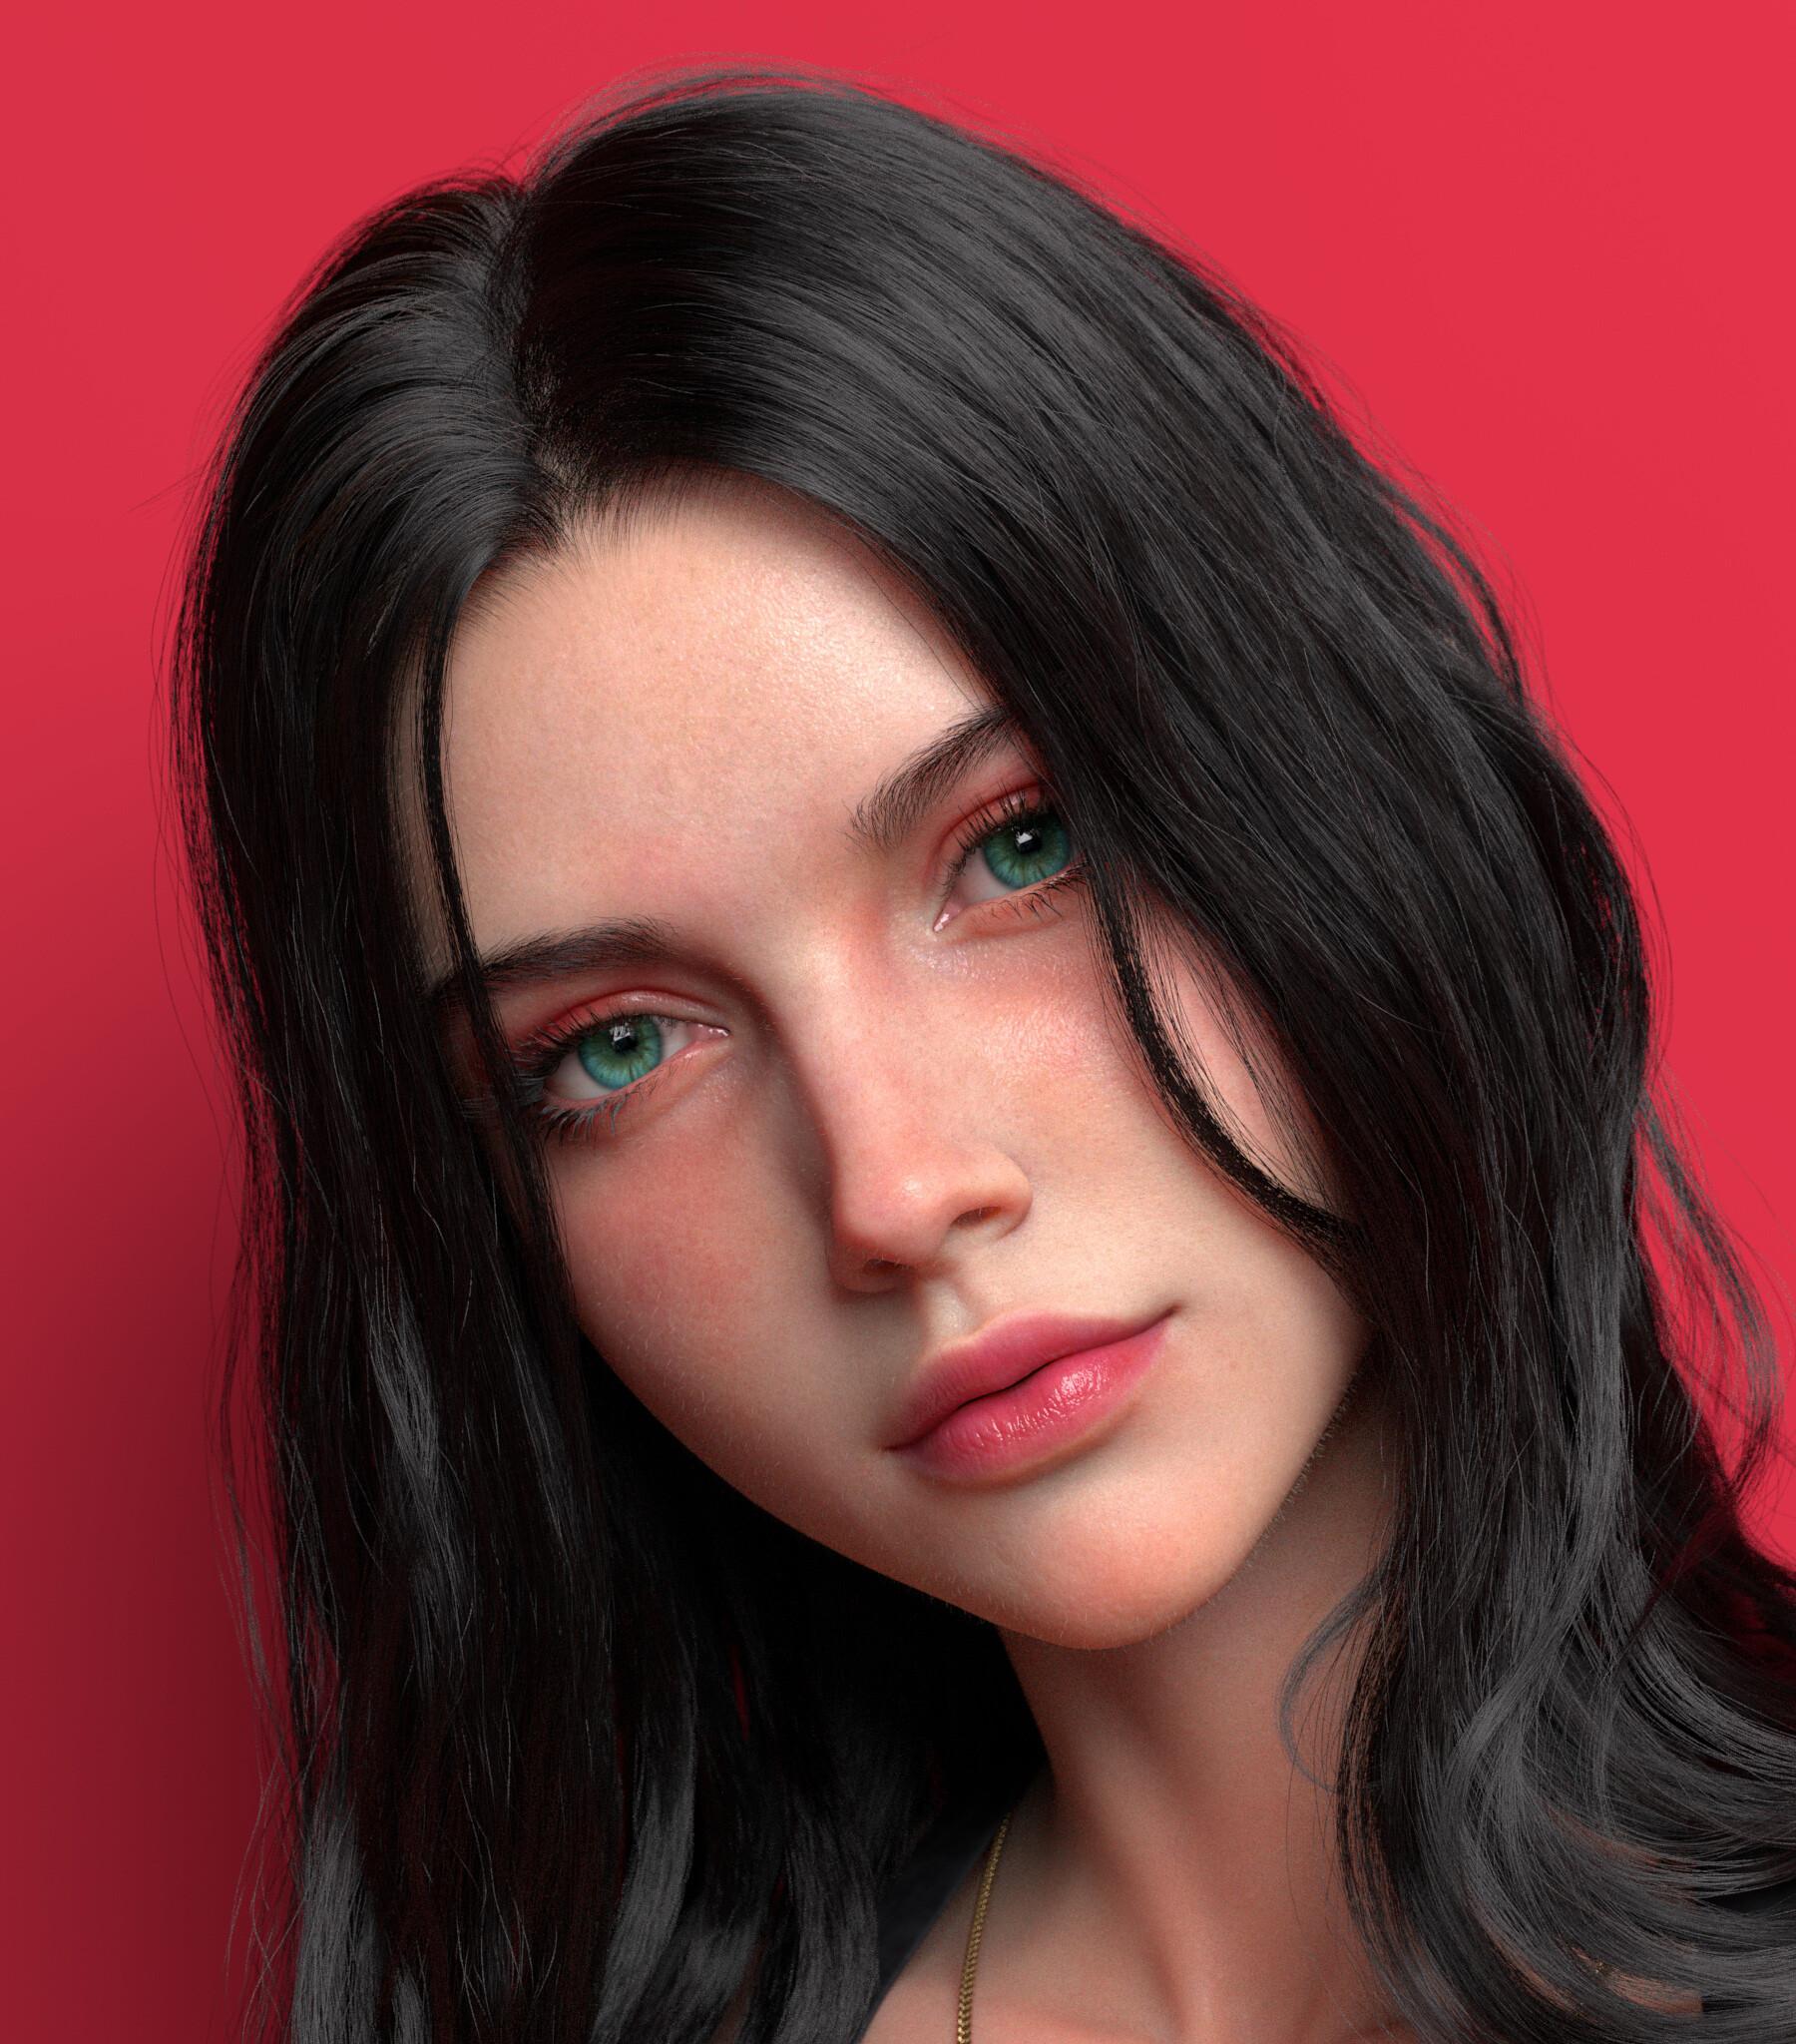 Chen Wang 3D CGi Render Face Women Looking At Viewer Dark Hair Green Eyes Closeup Red Background Sim 1800x2048